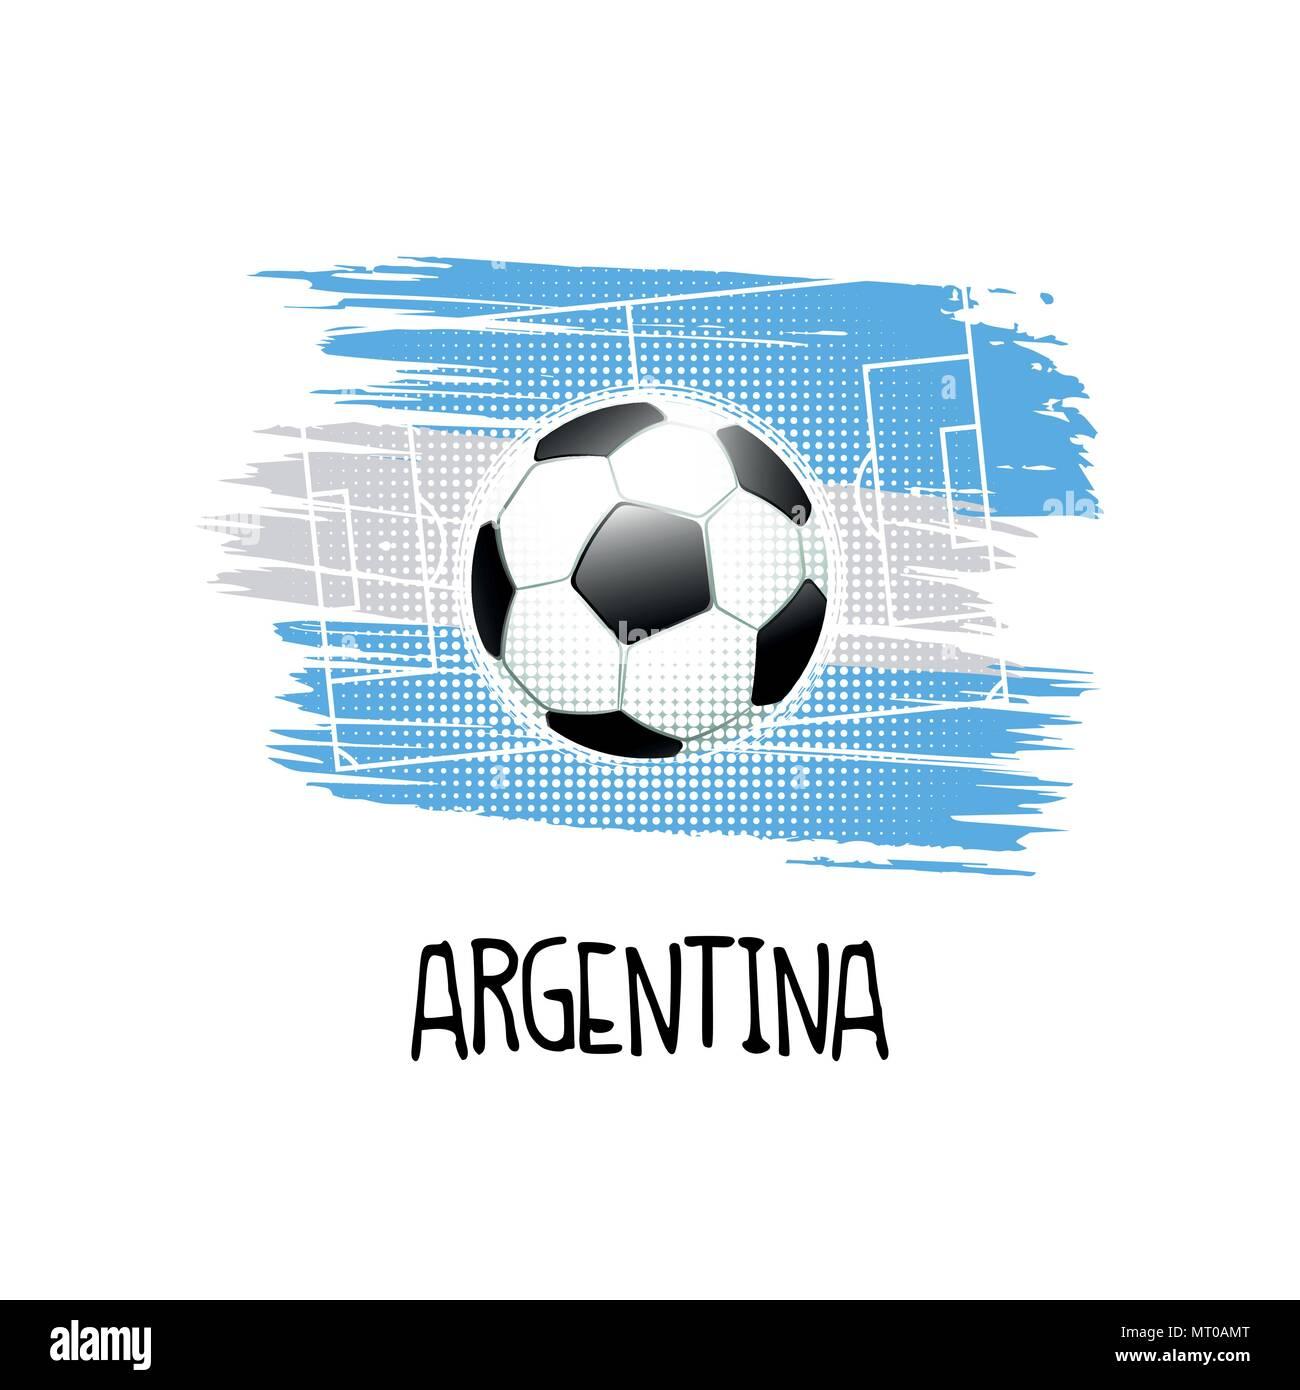 Argentina Vector Vectors Imágenes De Stock   Argentina Vector ... 85b7bee32944c